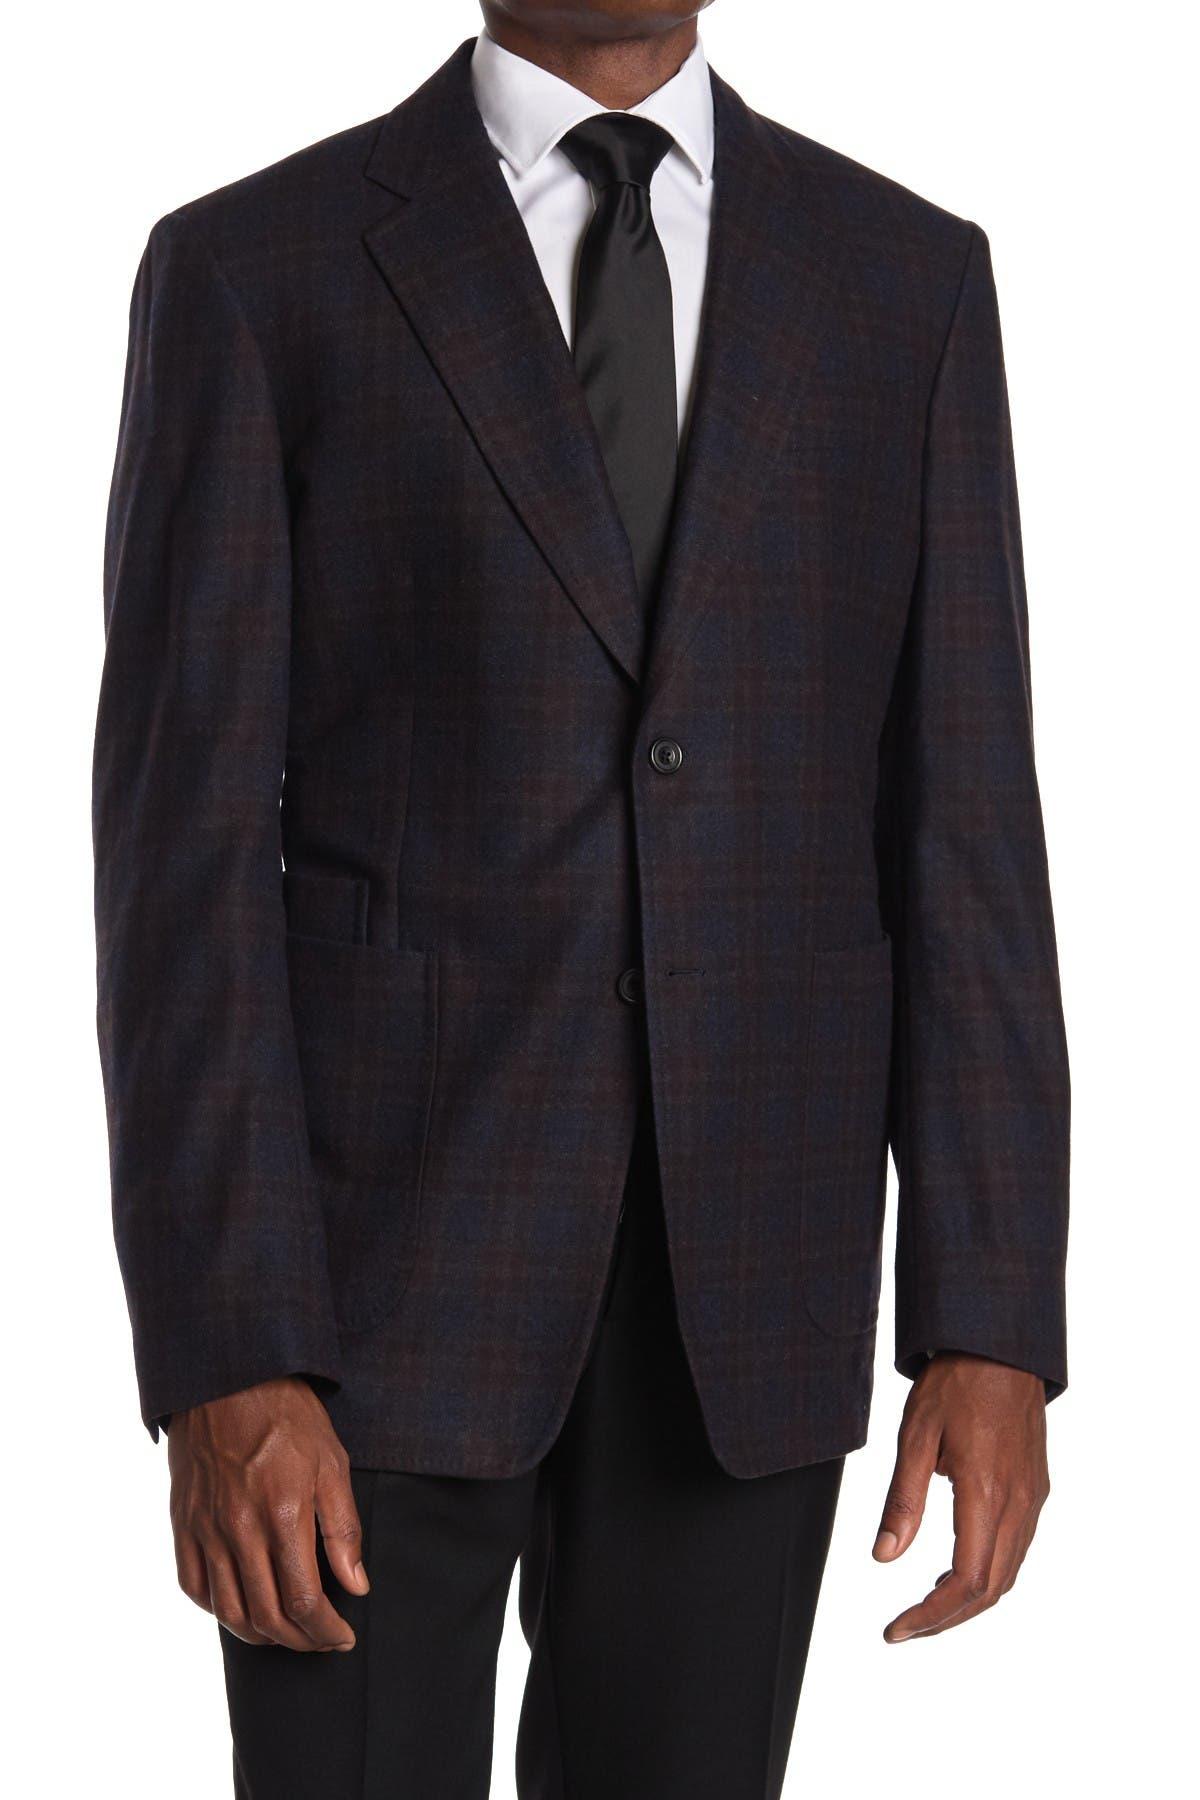 Image of THOMAS PINK Carlo Check Wool & Cashmere Blend Jacket